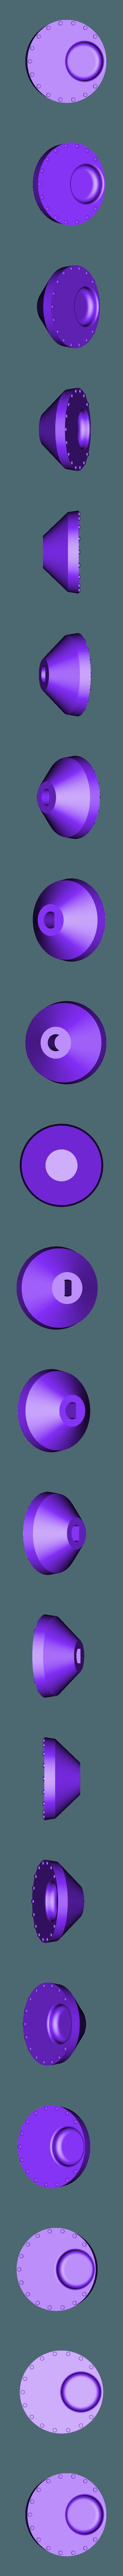 Sunken_Knob_v2.stl Télécharger fichier STL gratuit Ultimaker 2 Bouton enfoncé • Objet pour impression 3D, HeyVye